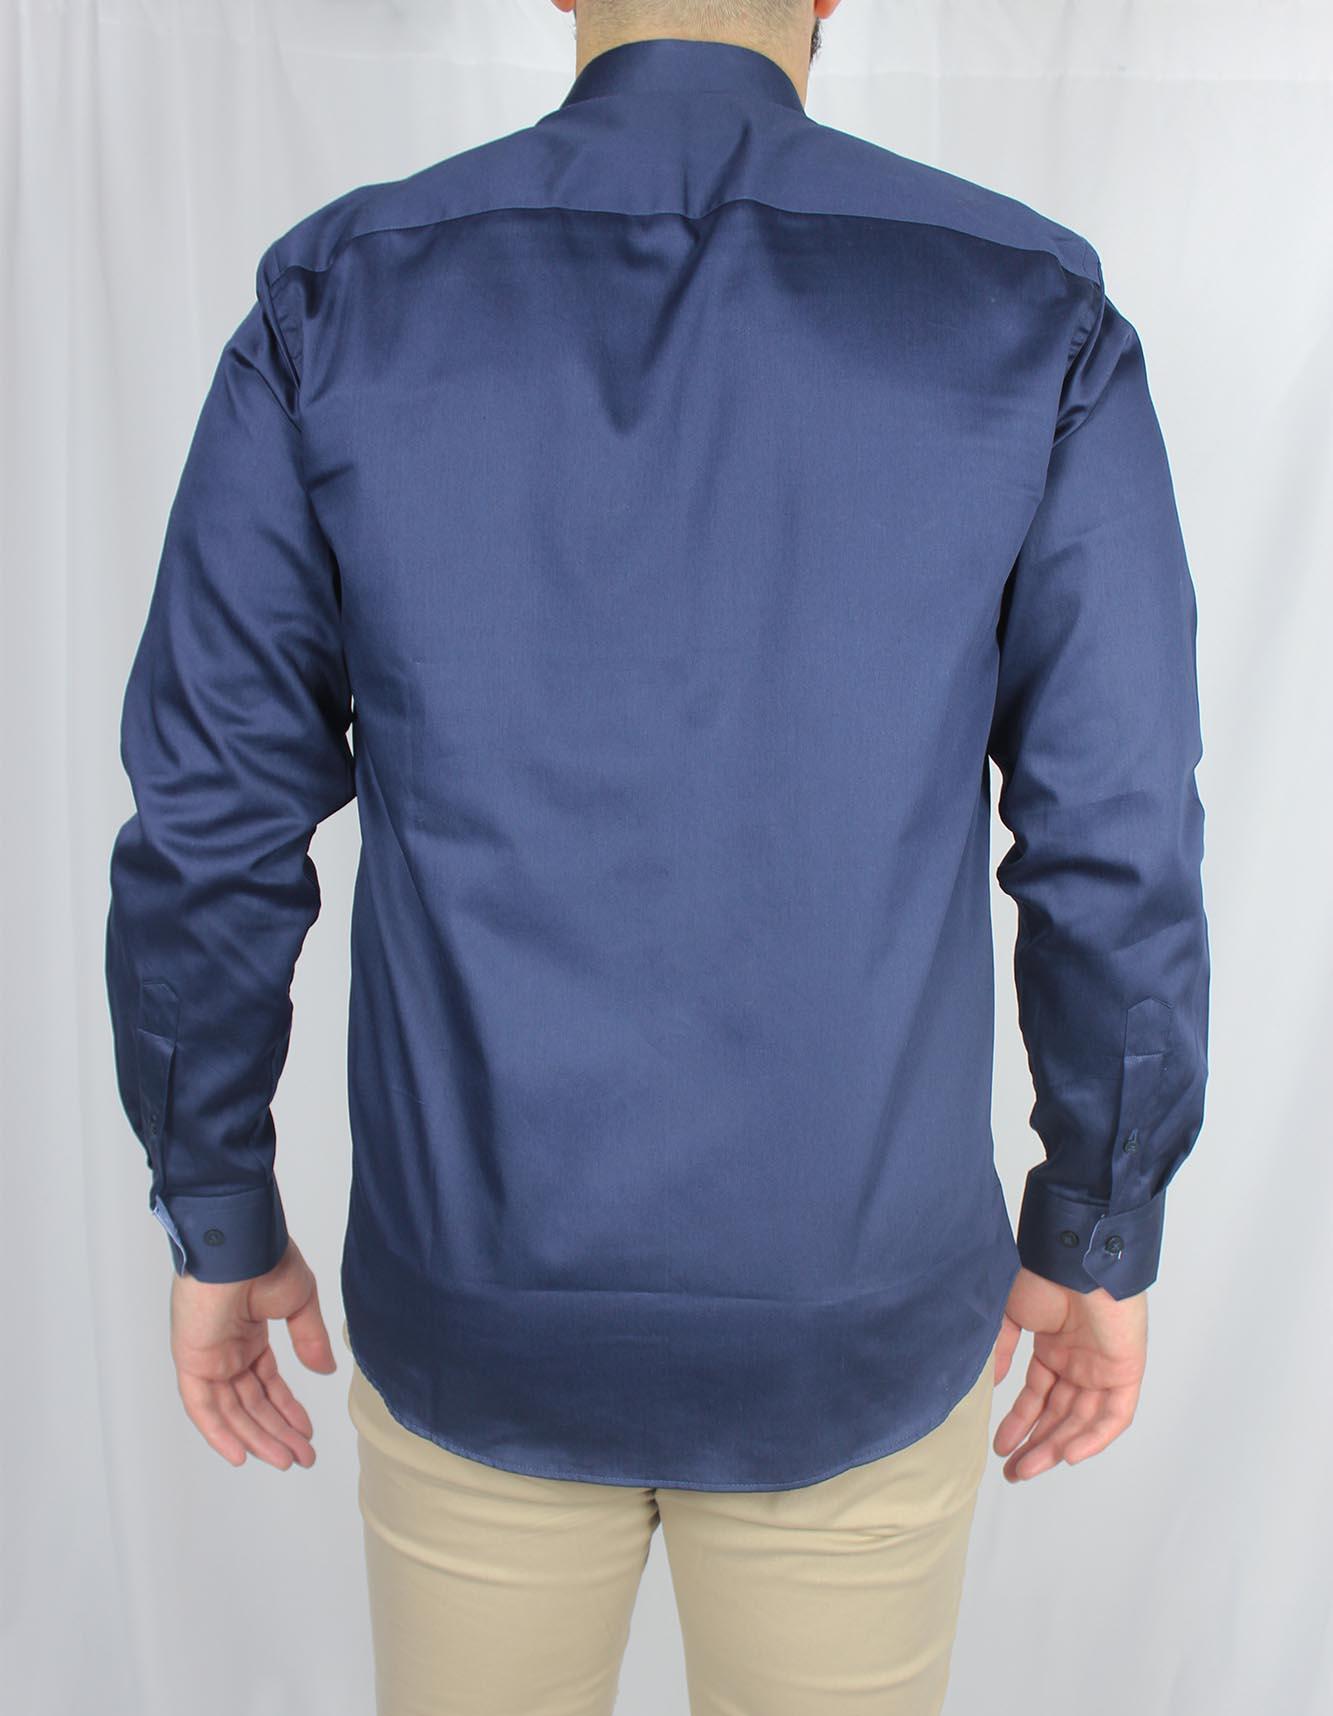 Camisa Social Comfort Fit Detalhe Xadrez MO Masculina - Azul Marinho